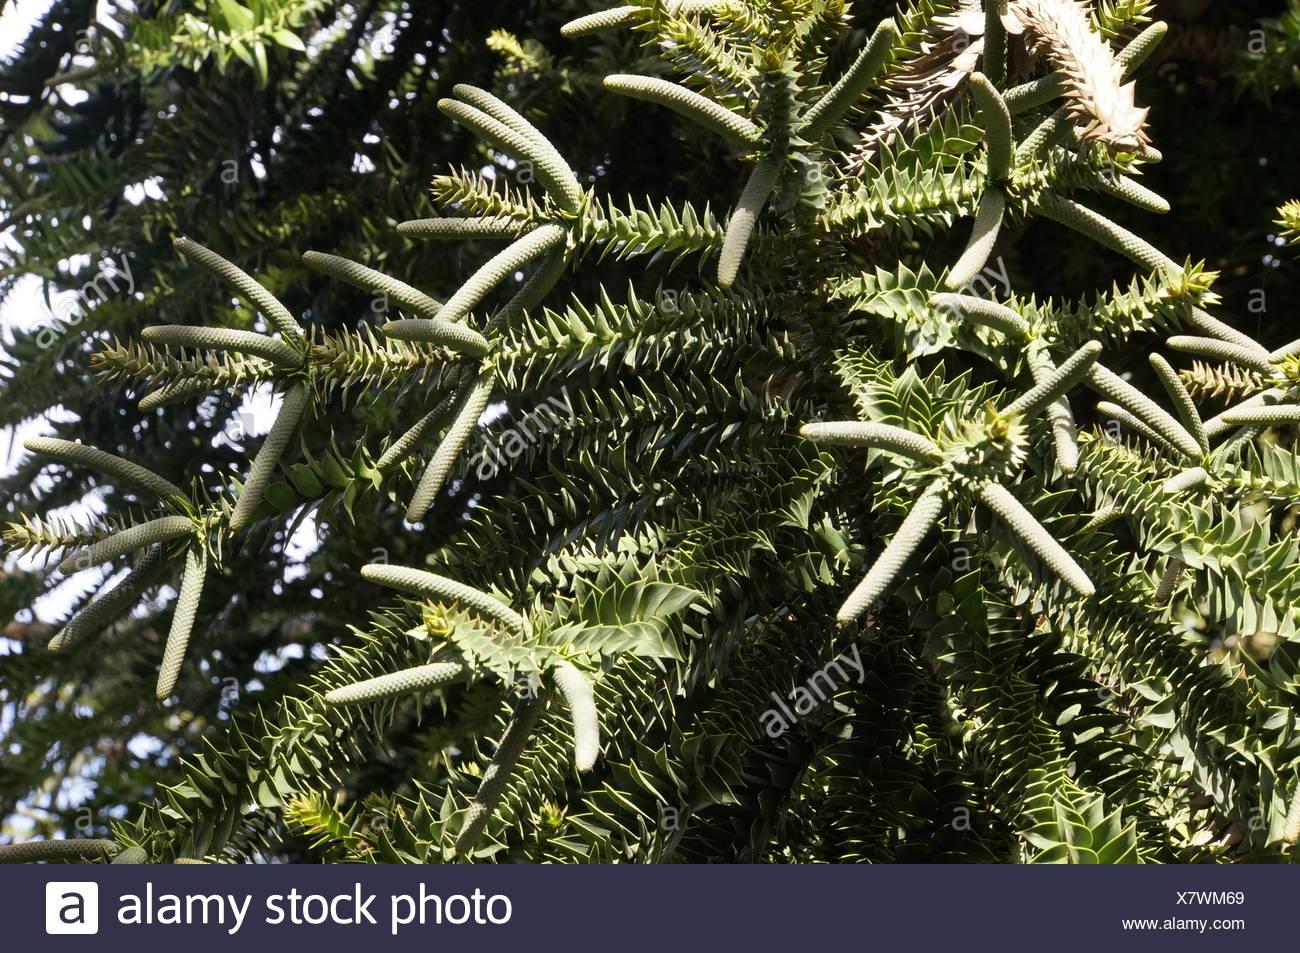 7pines teneriffa pioneer avh 280bt softwareupdate araucaria bidwillii stock photos and